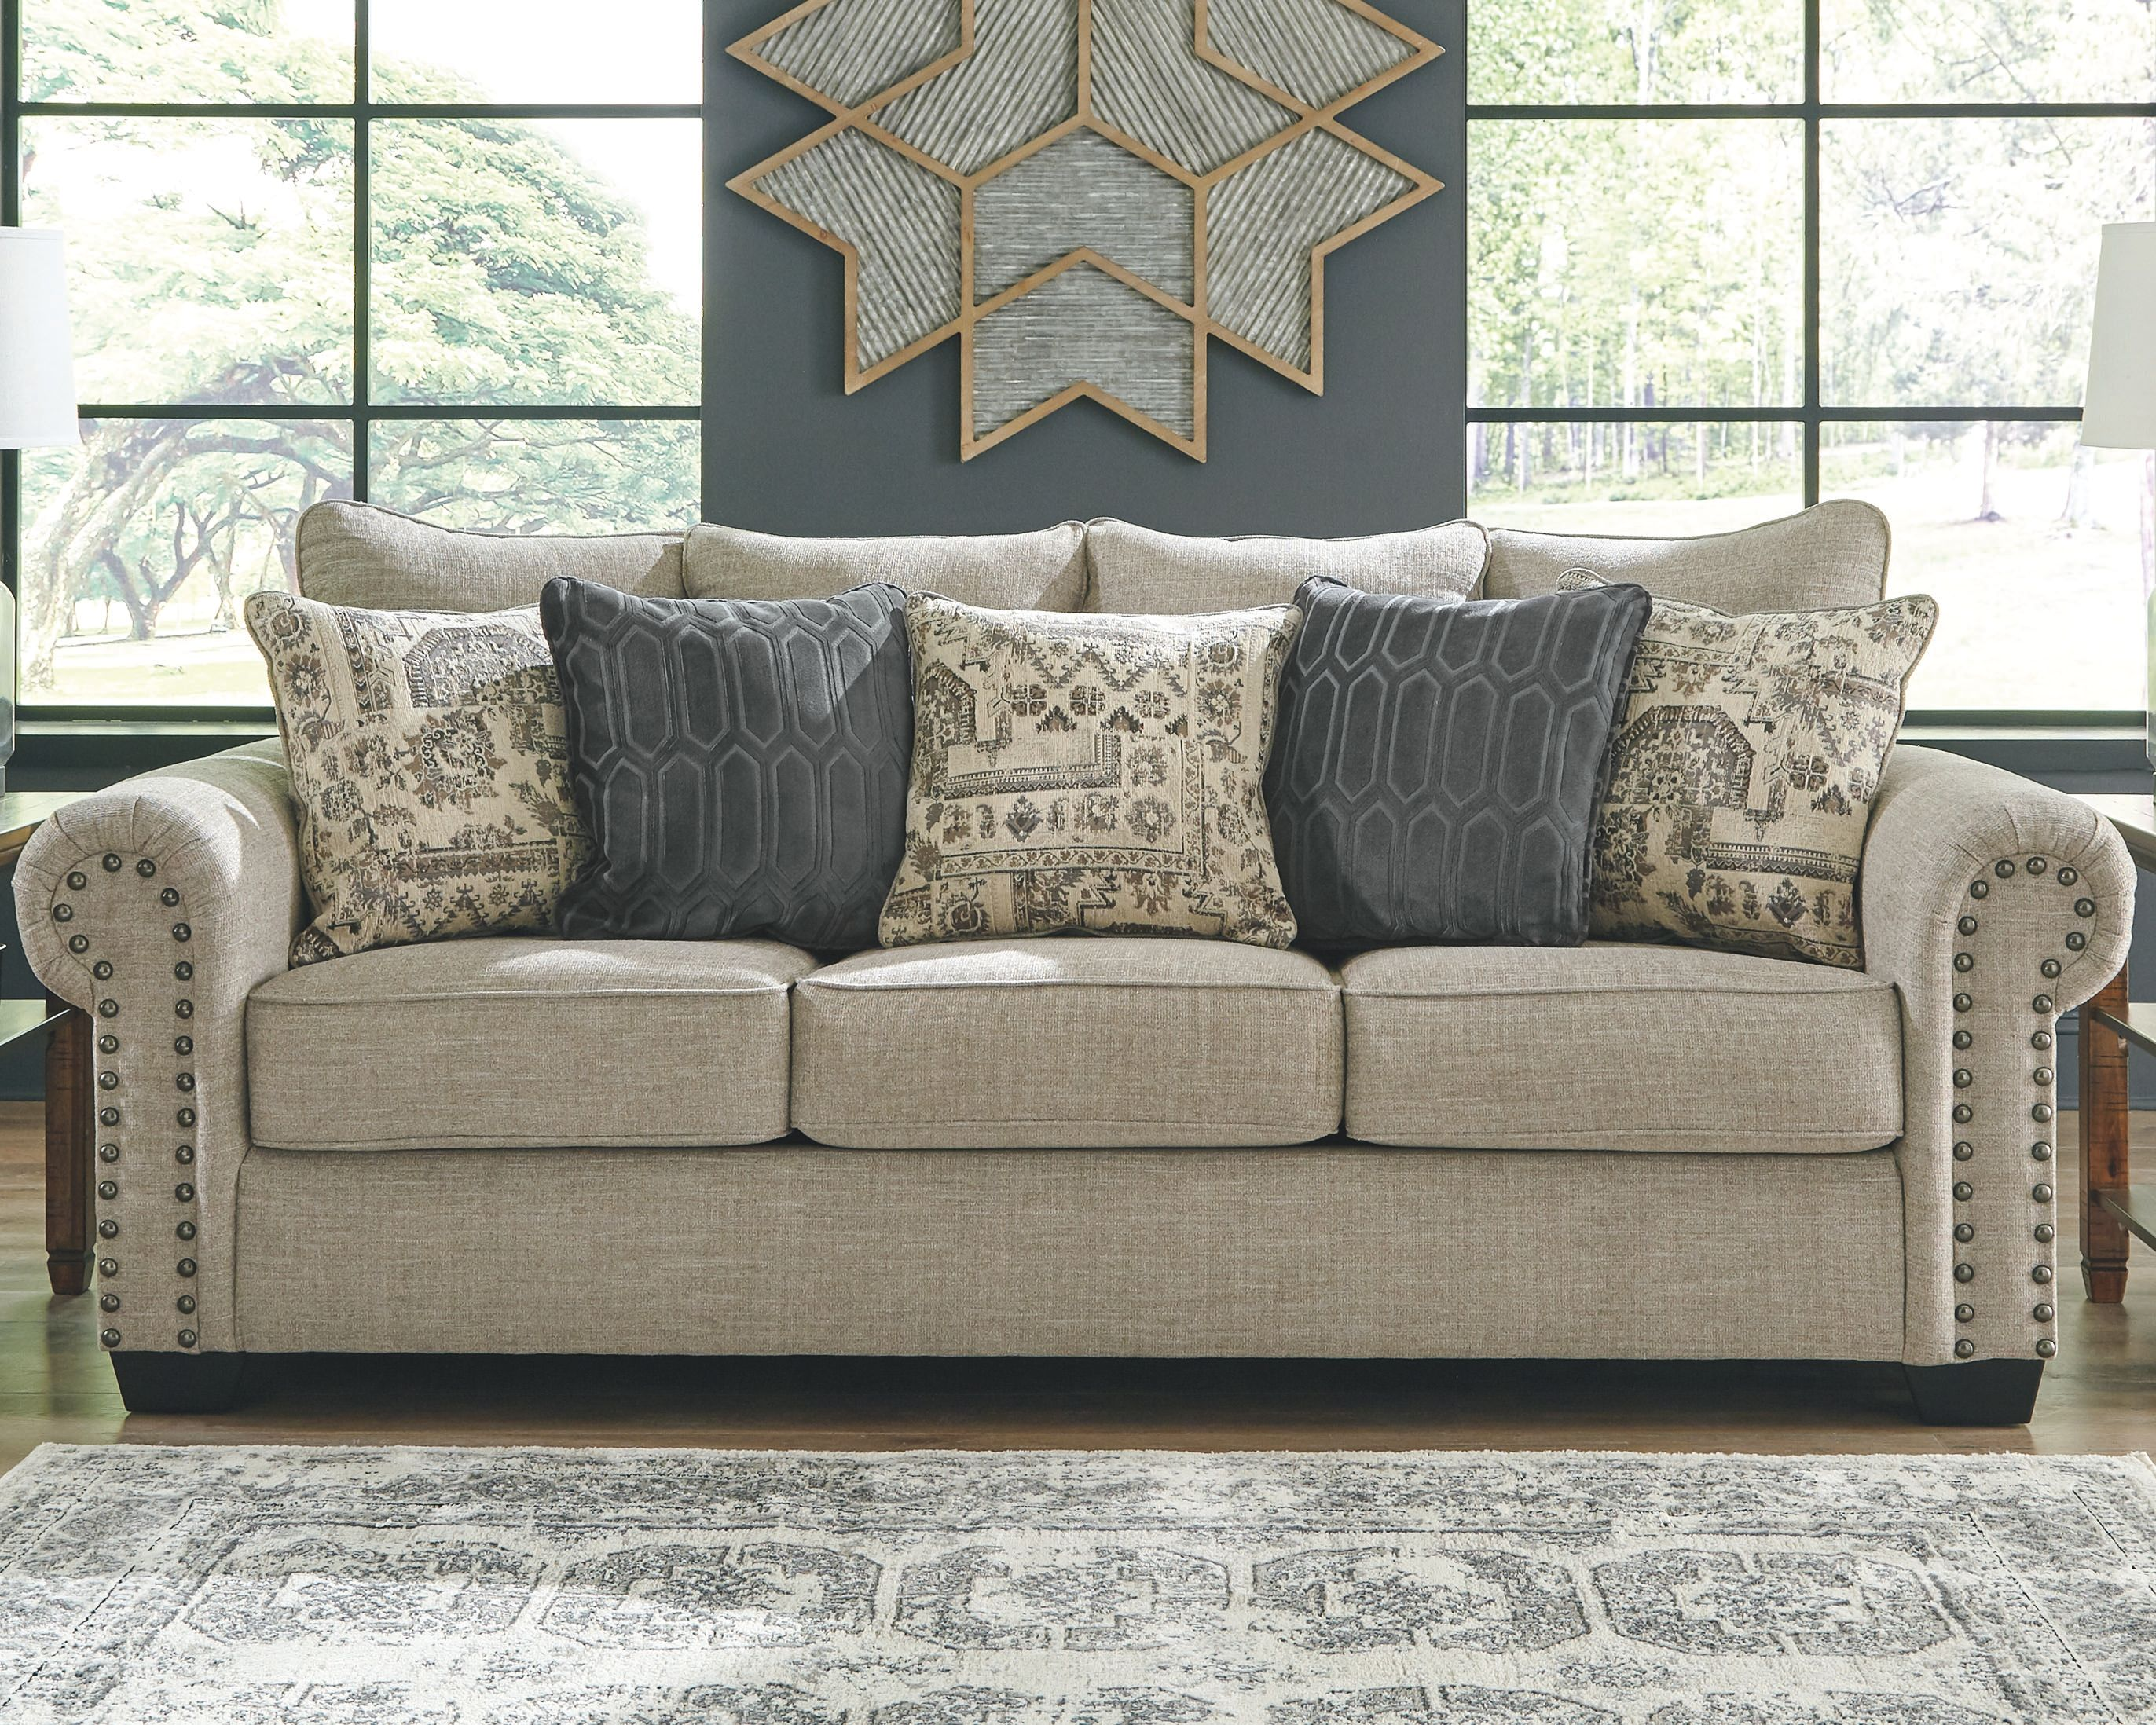 Pin By Erica Ruiz On My Home In 2020 Furniture Furniture Homestore Ashley Furniture